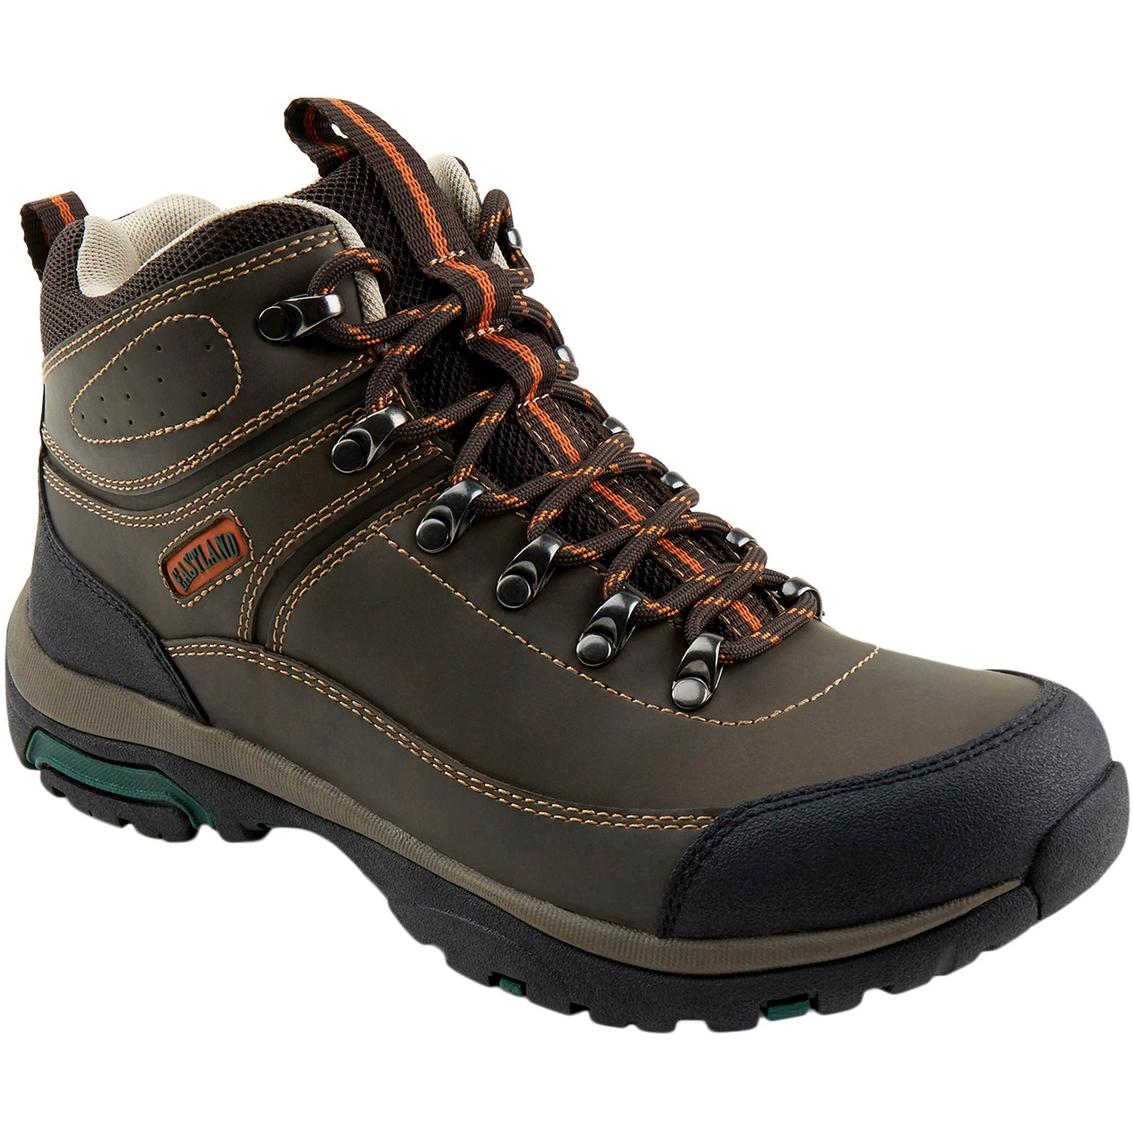 2e1572c2018 Eastland Men's Rutland Mid Trail Hiker Boots | Hiking | Shoes | Shop ...